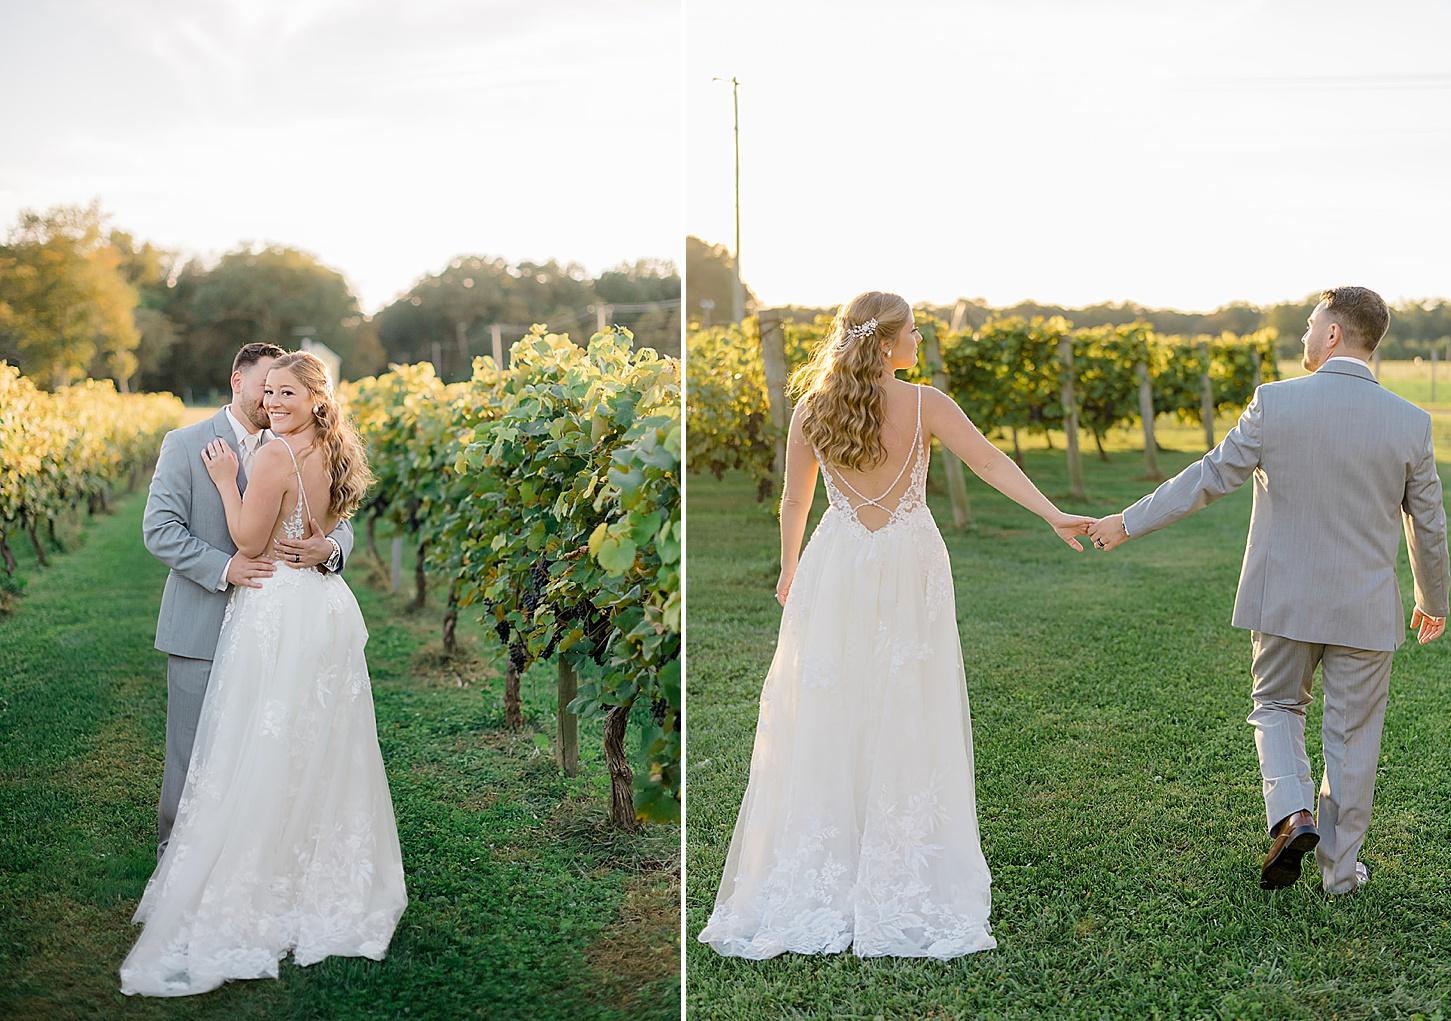 Valenzano Winery Vitners Pavillion Wedding Photography by Magdalena Studios 0031